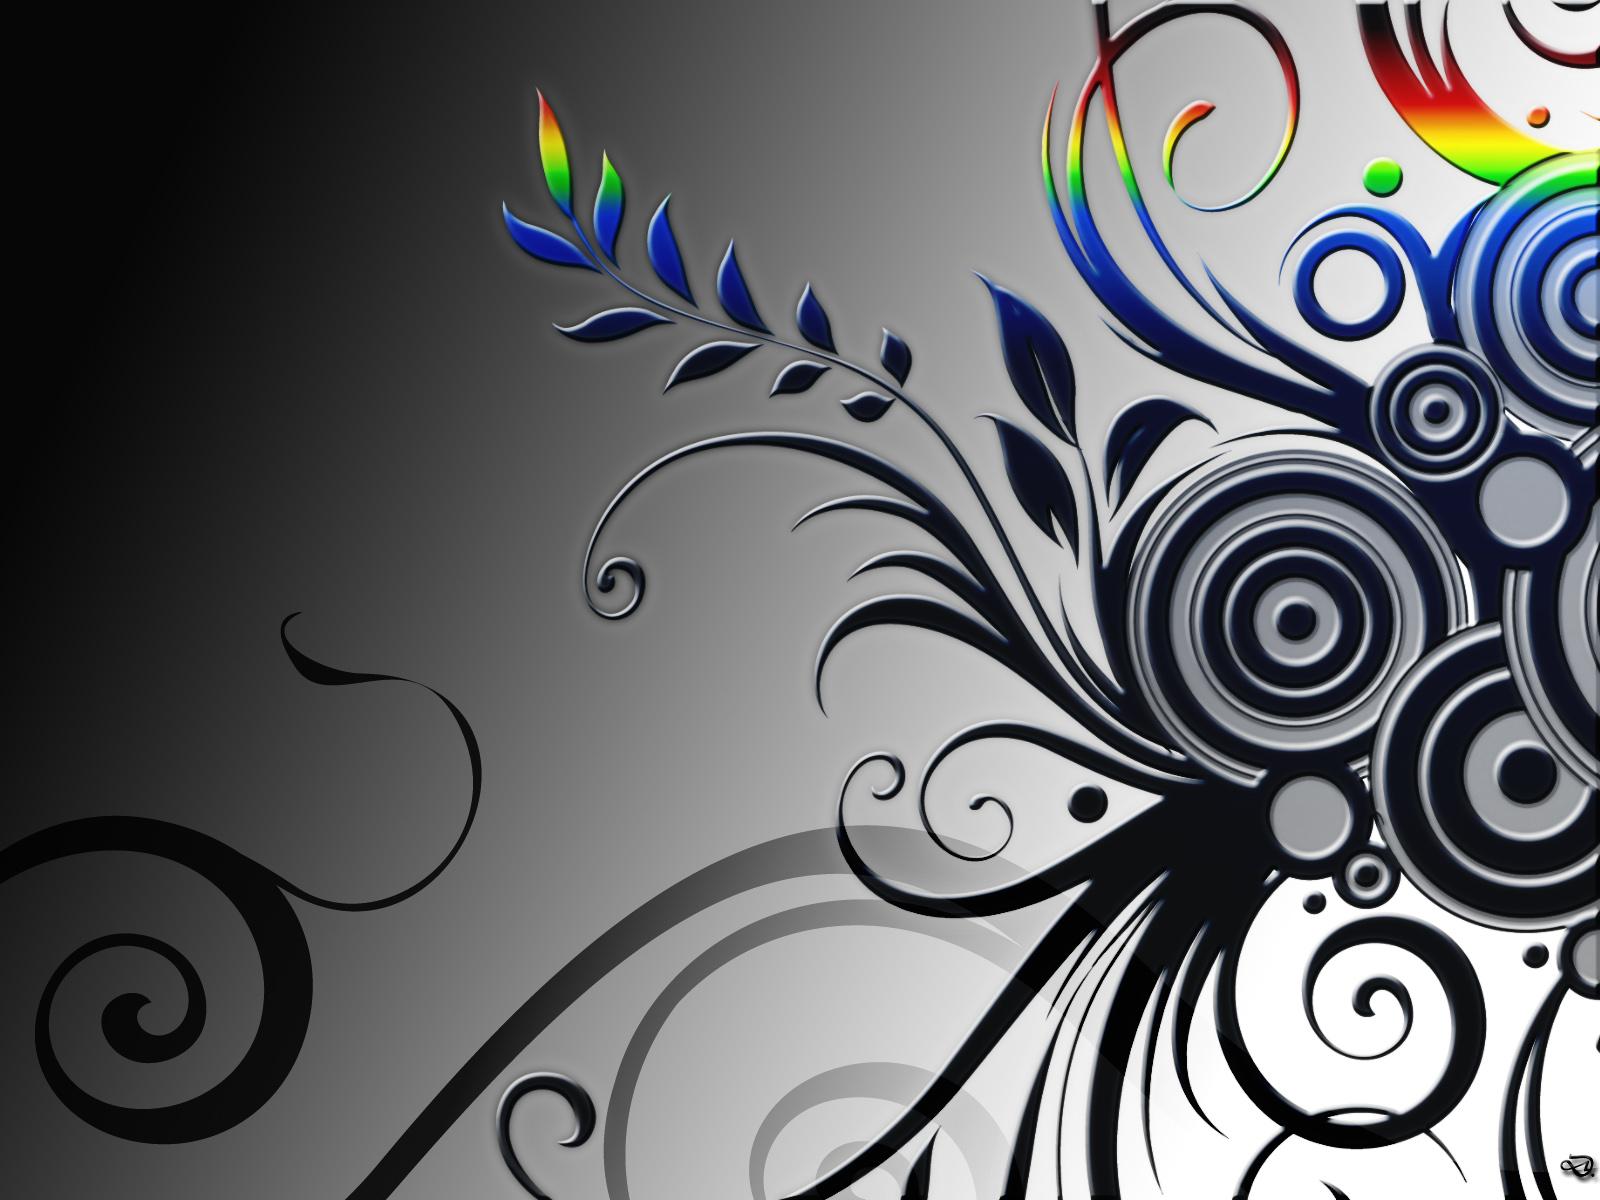 Free Download Black And White Vines Desktop Wallpaper